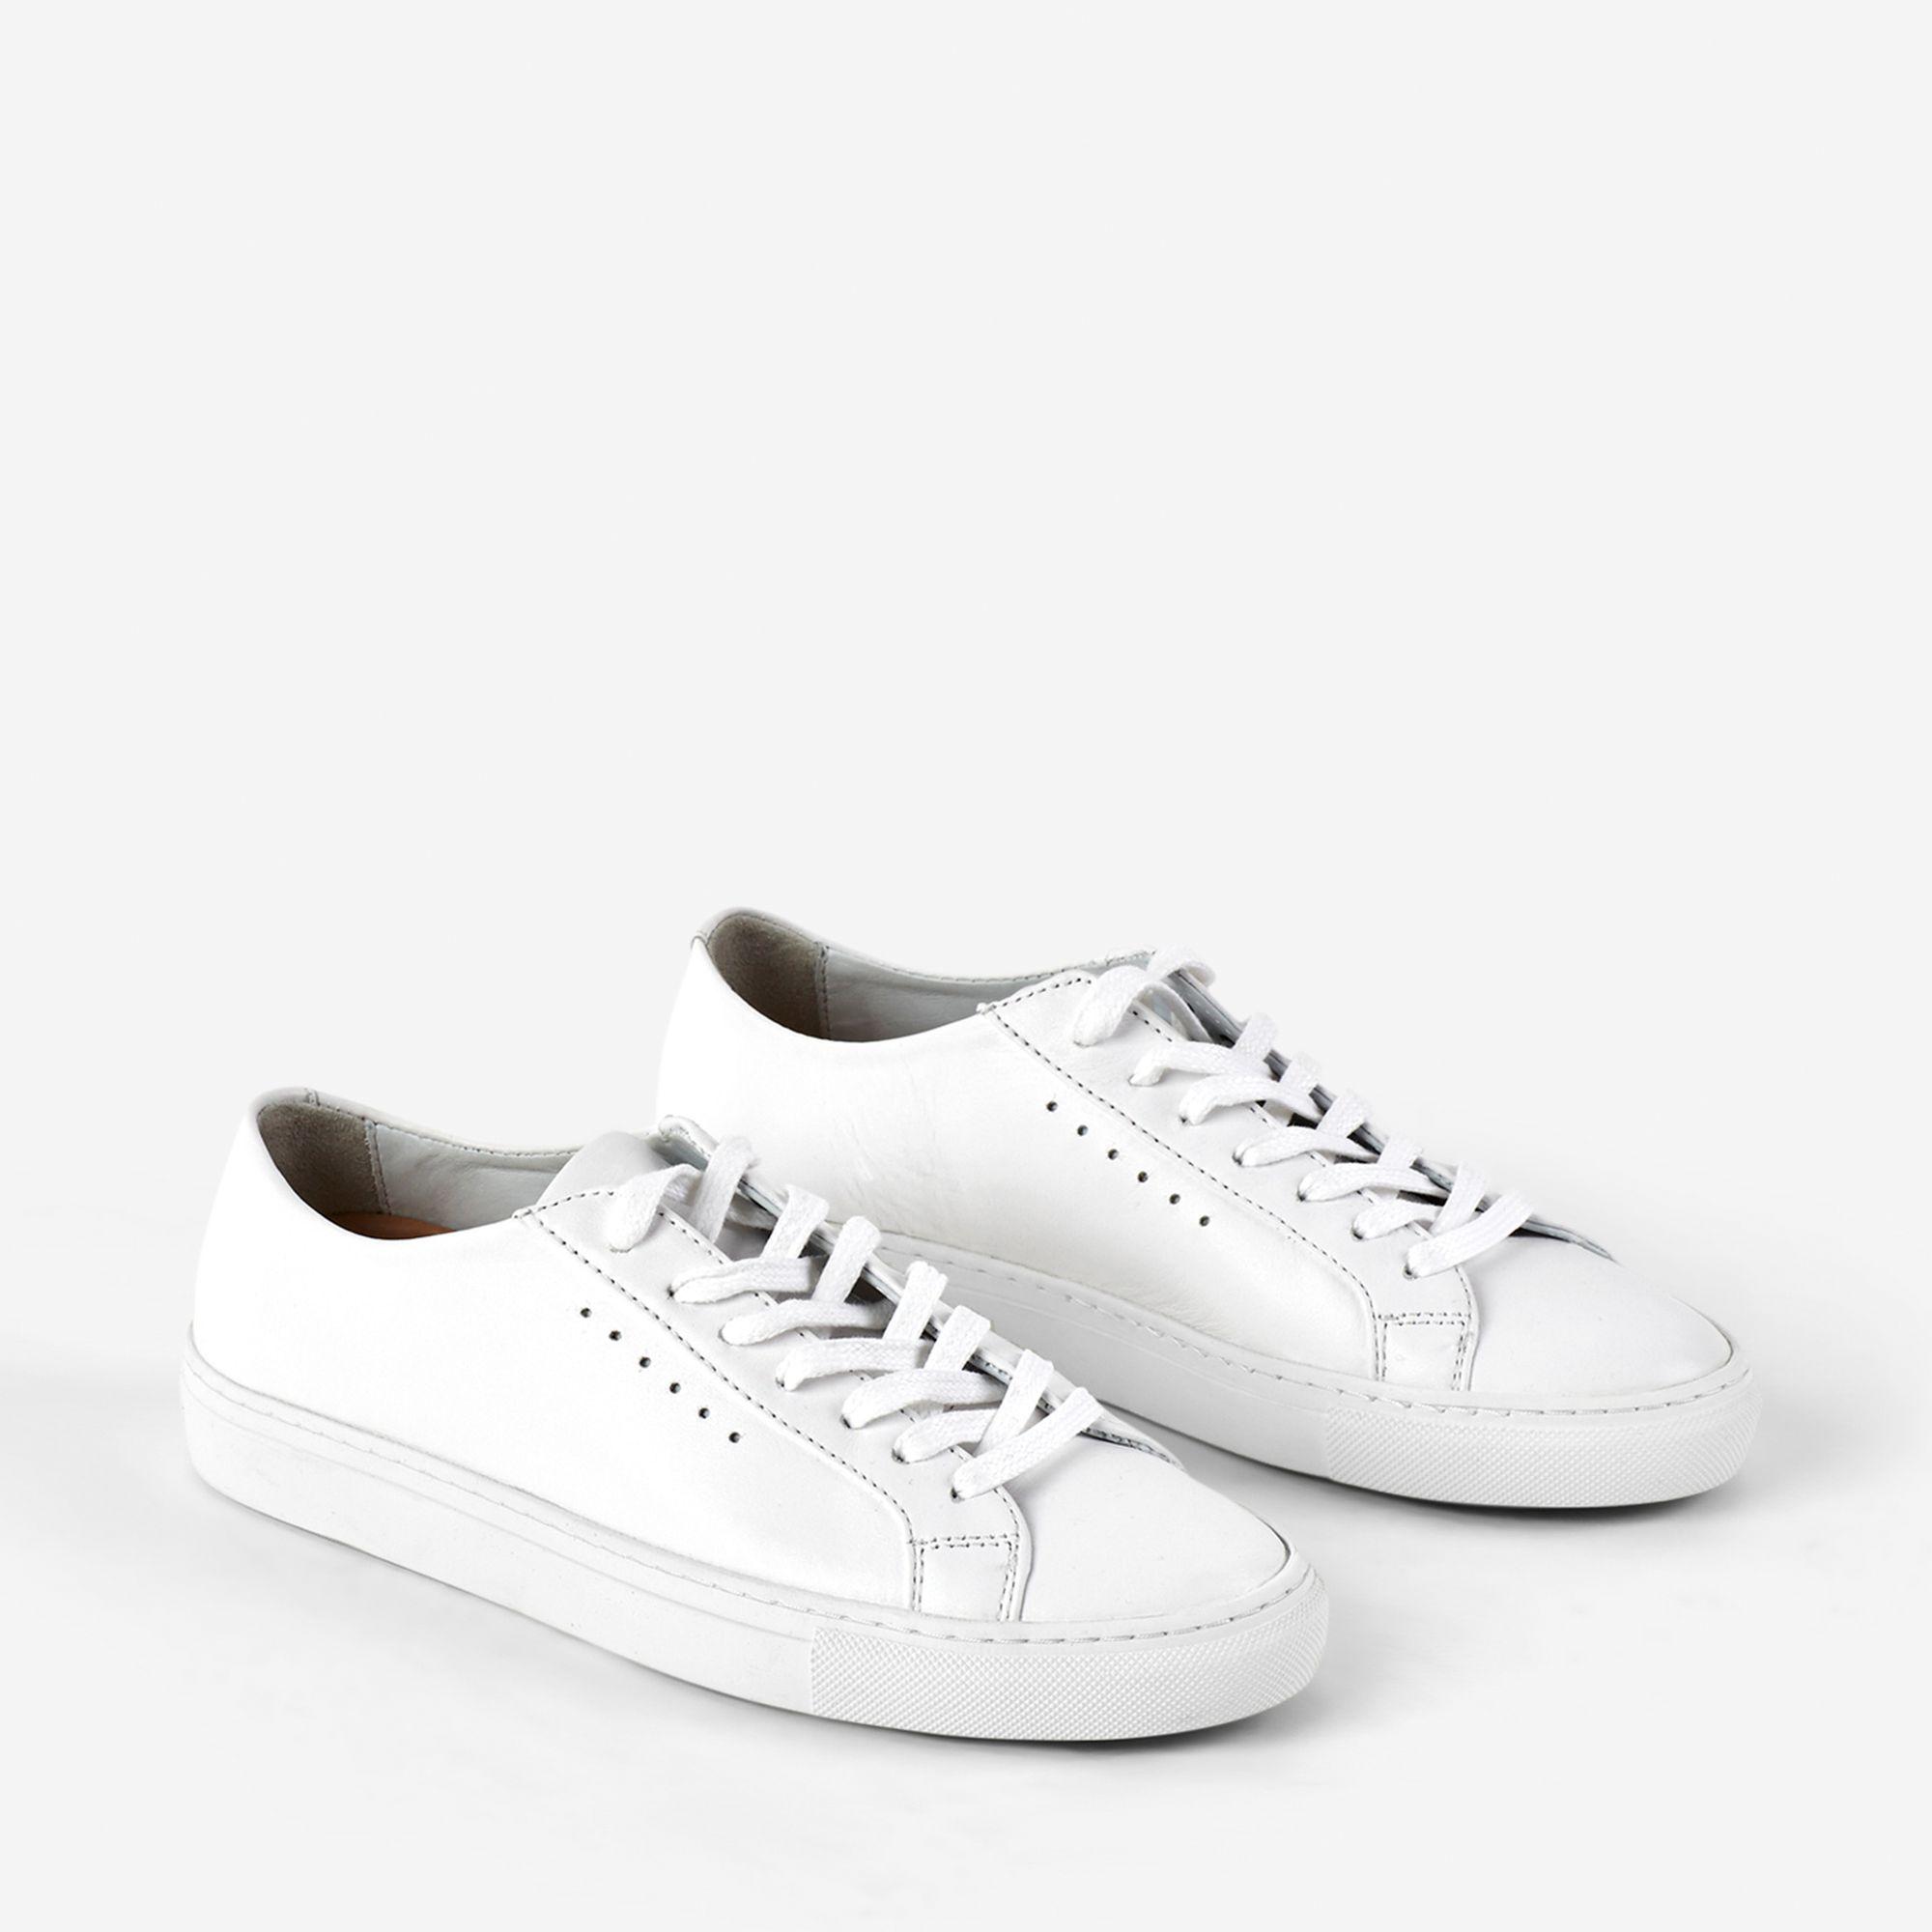 Filippa K Kate Low Sneaker sneakers i skinn, Vit, 37